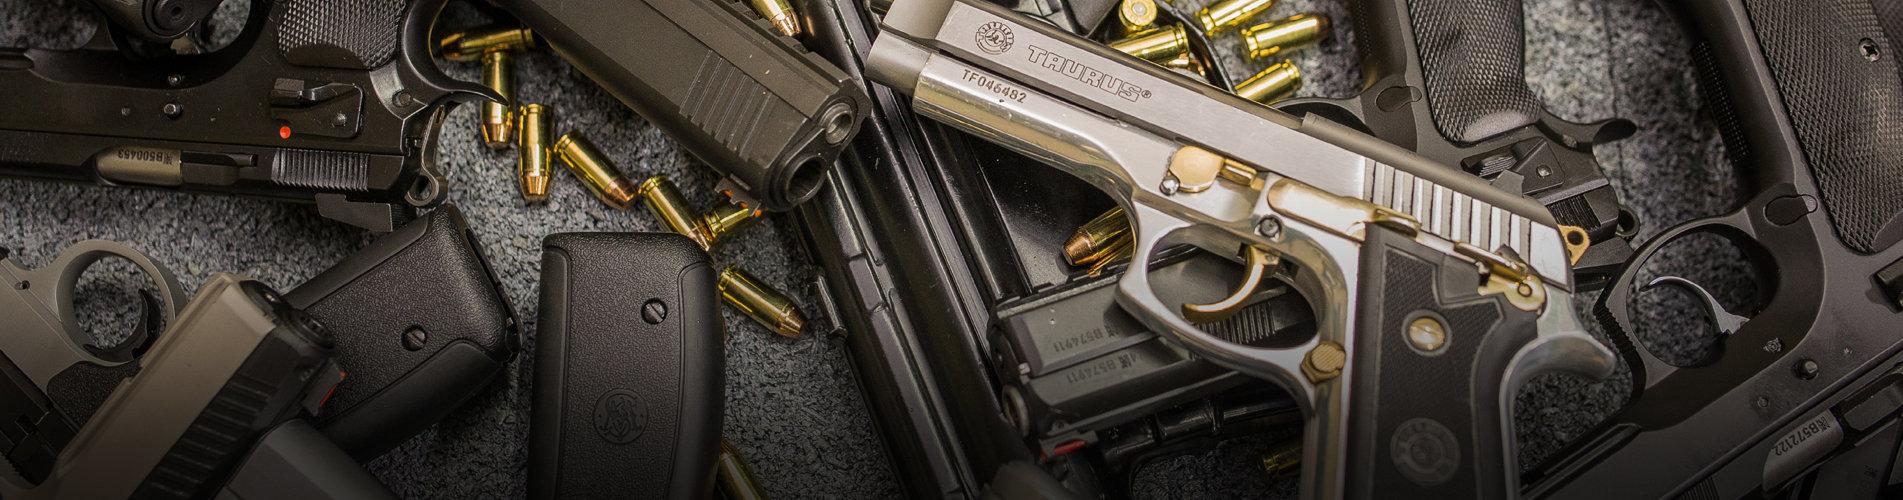 фото пистолетов в тире гепард